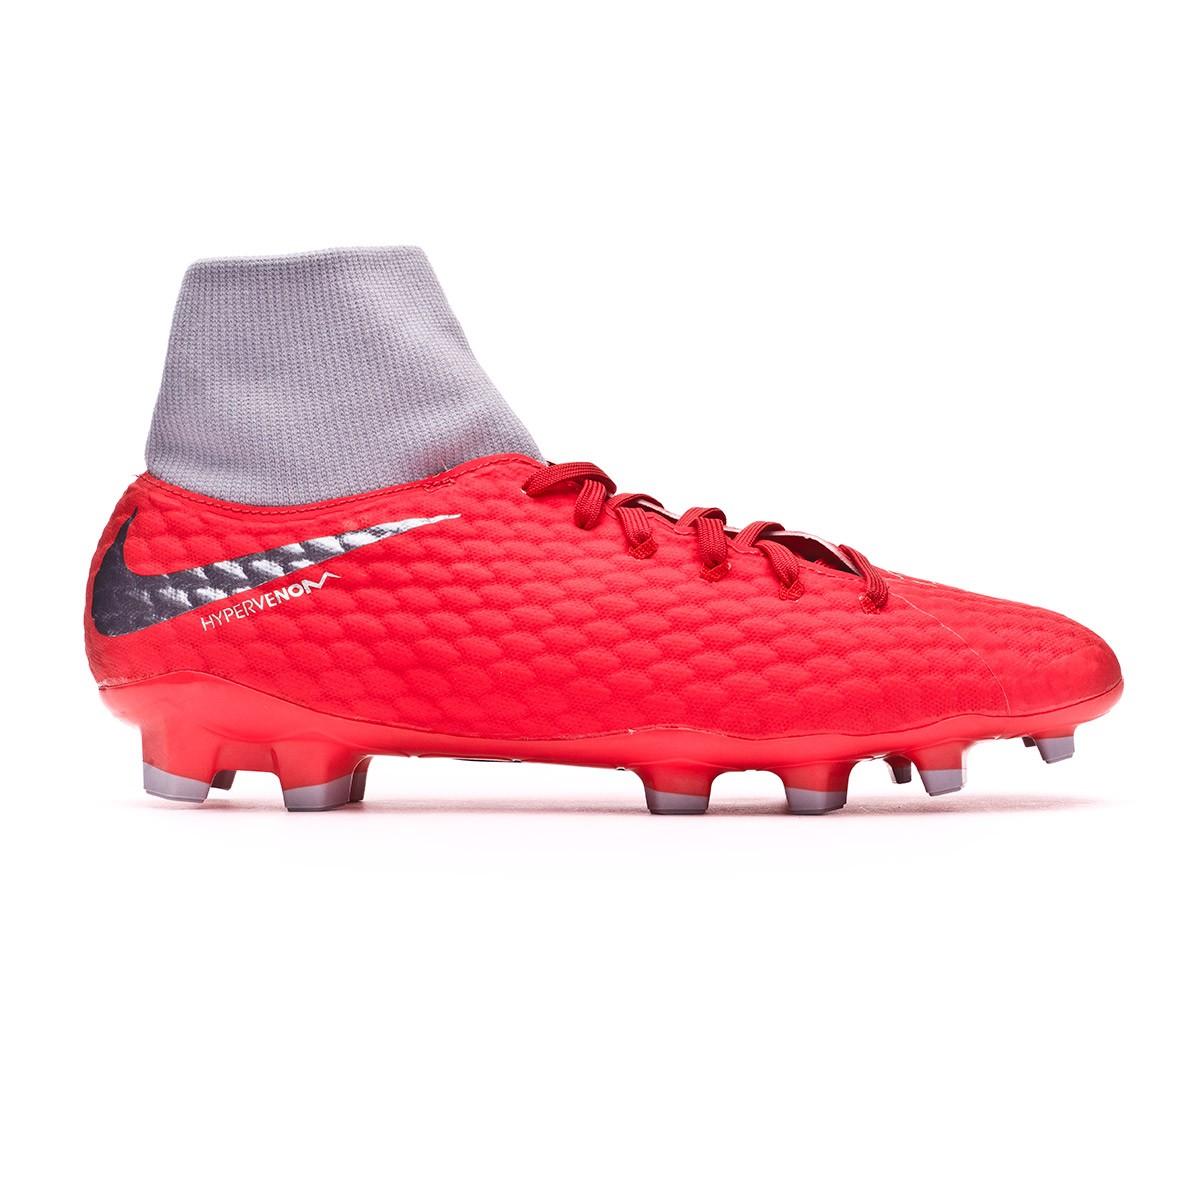 Chuteira Nike Hypervenom Phantom III Academy DF FG Light crimson-Metallic  dark grey-Wolf grey - Loja de futebol Fútbol Emotion d4e2772734a43